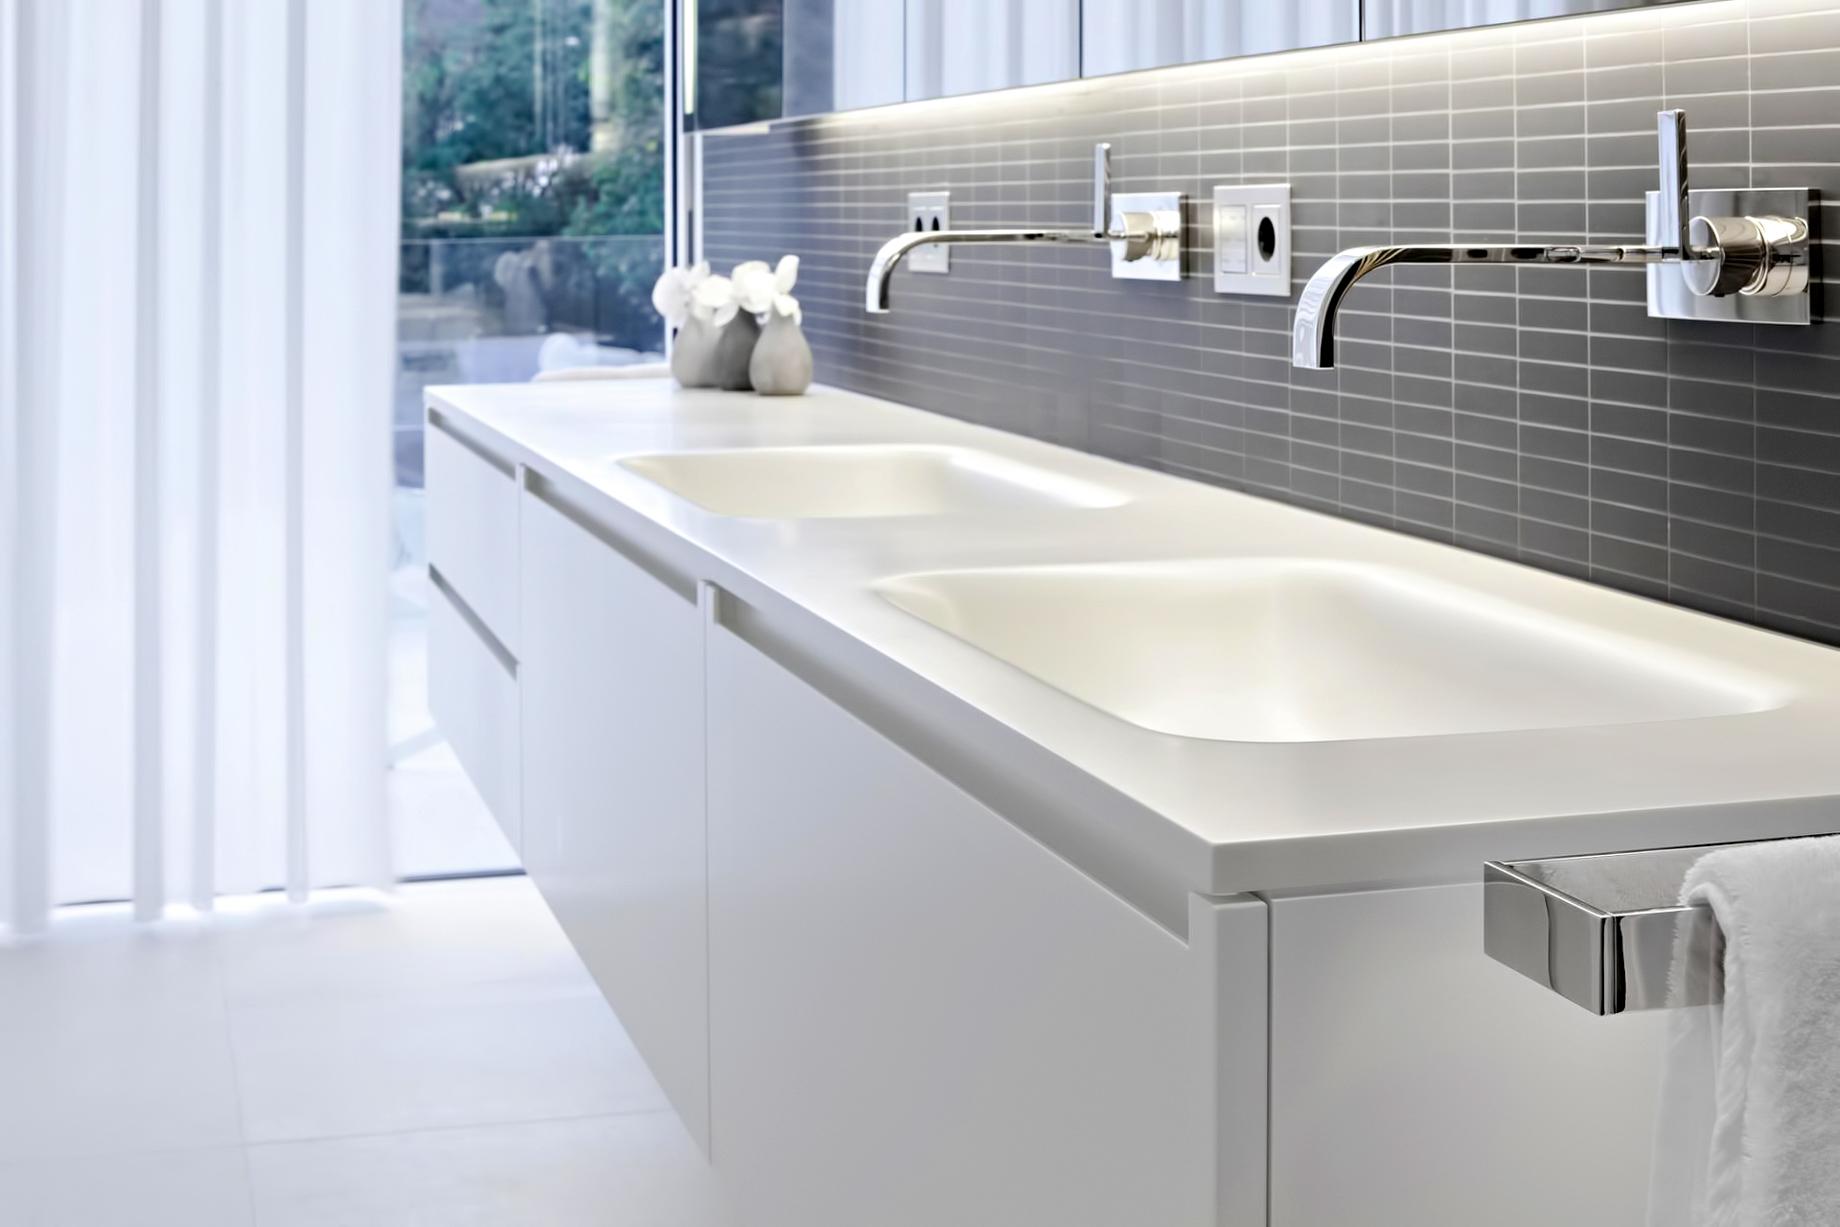 House M Luxury Residence - Merano, South Tyrol, Italy